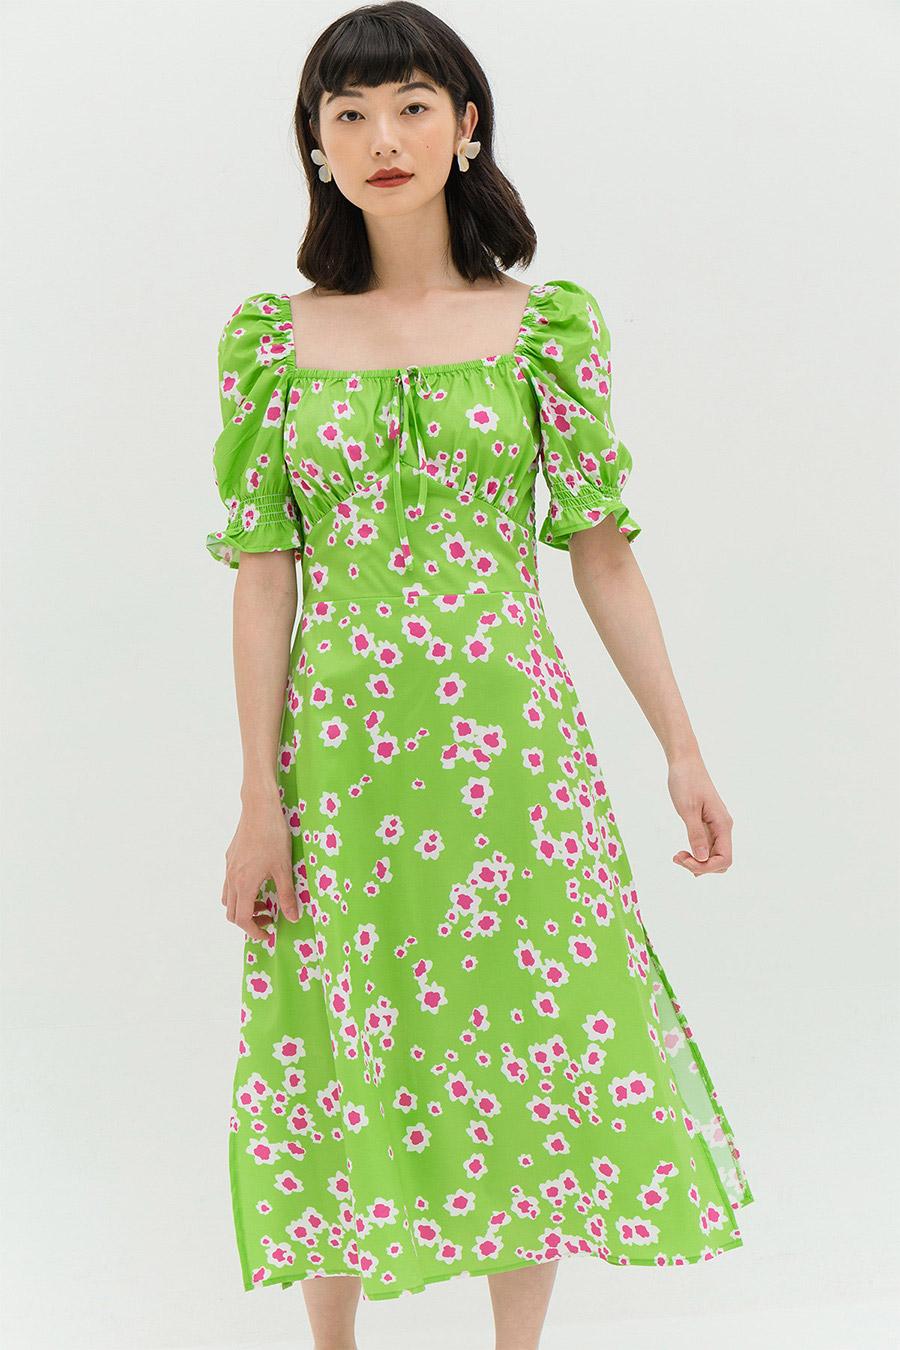 PEGGY DRESS - BISCAY FLEUR